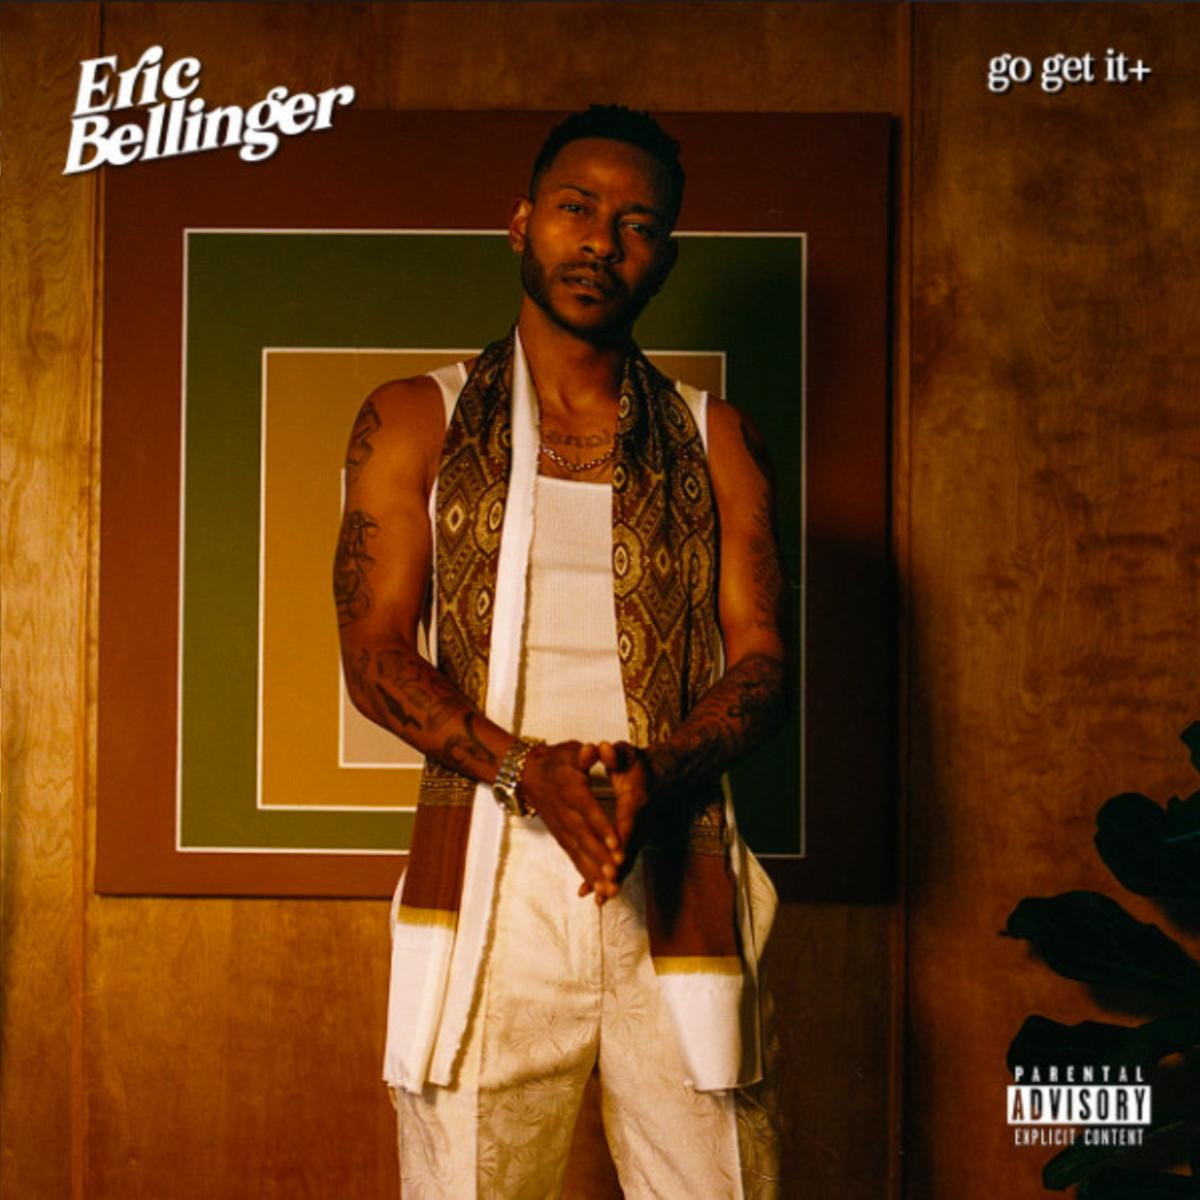 MP3: Eric Bellinger - Go Get It